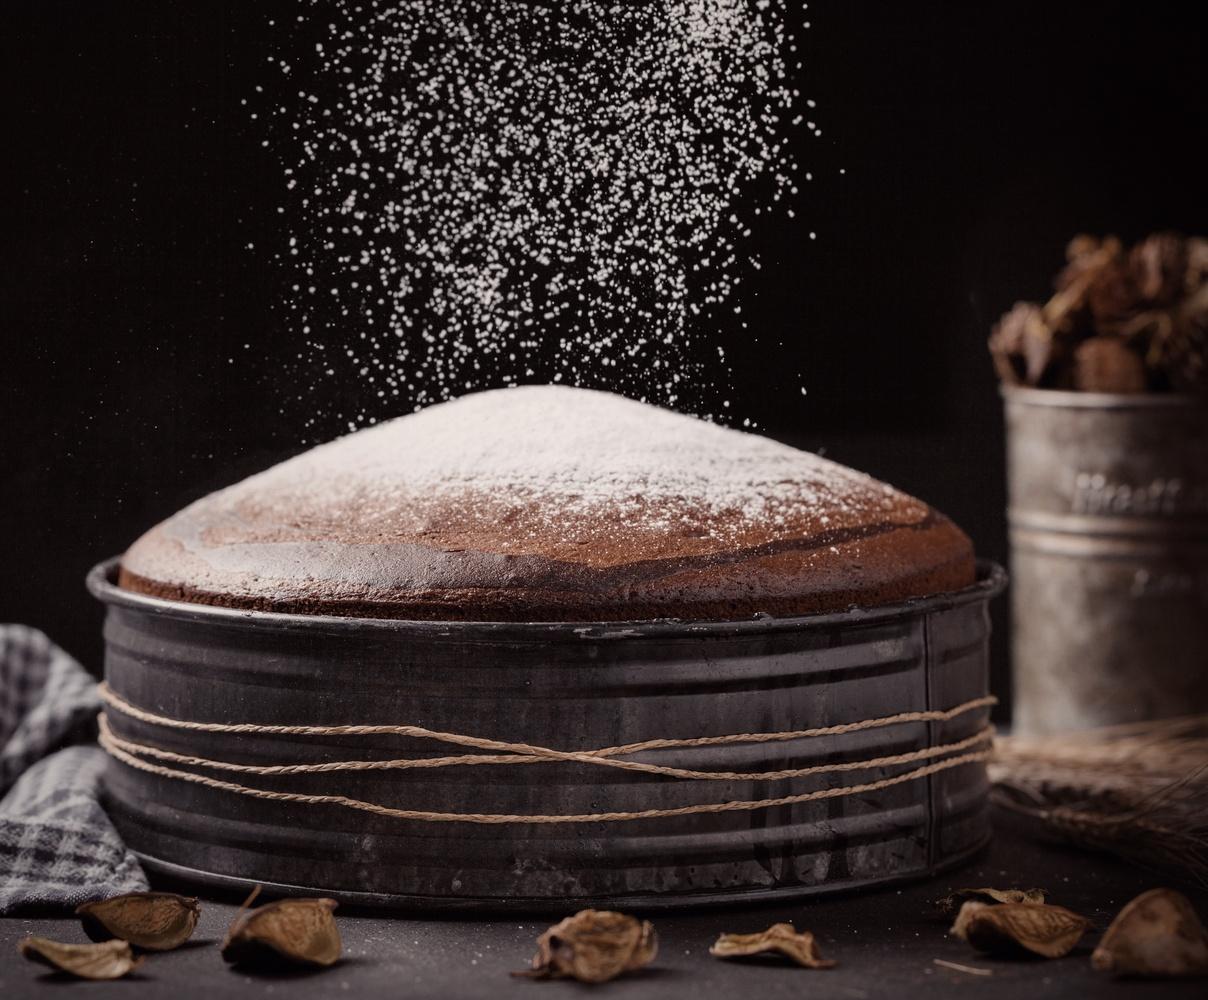 Cake Everest by Firat Tuzunkan